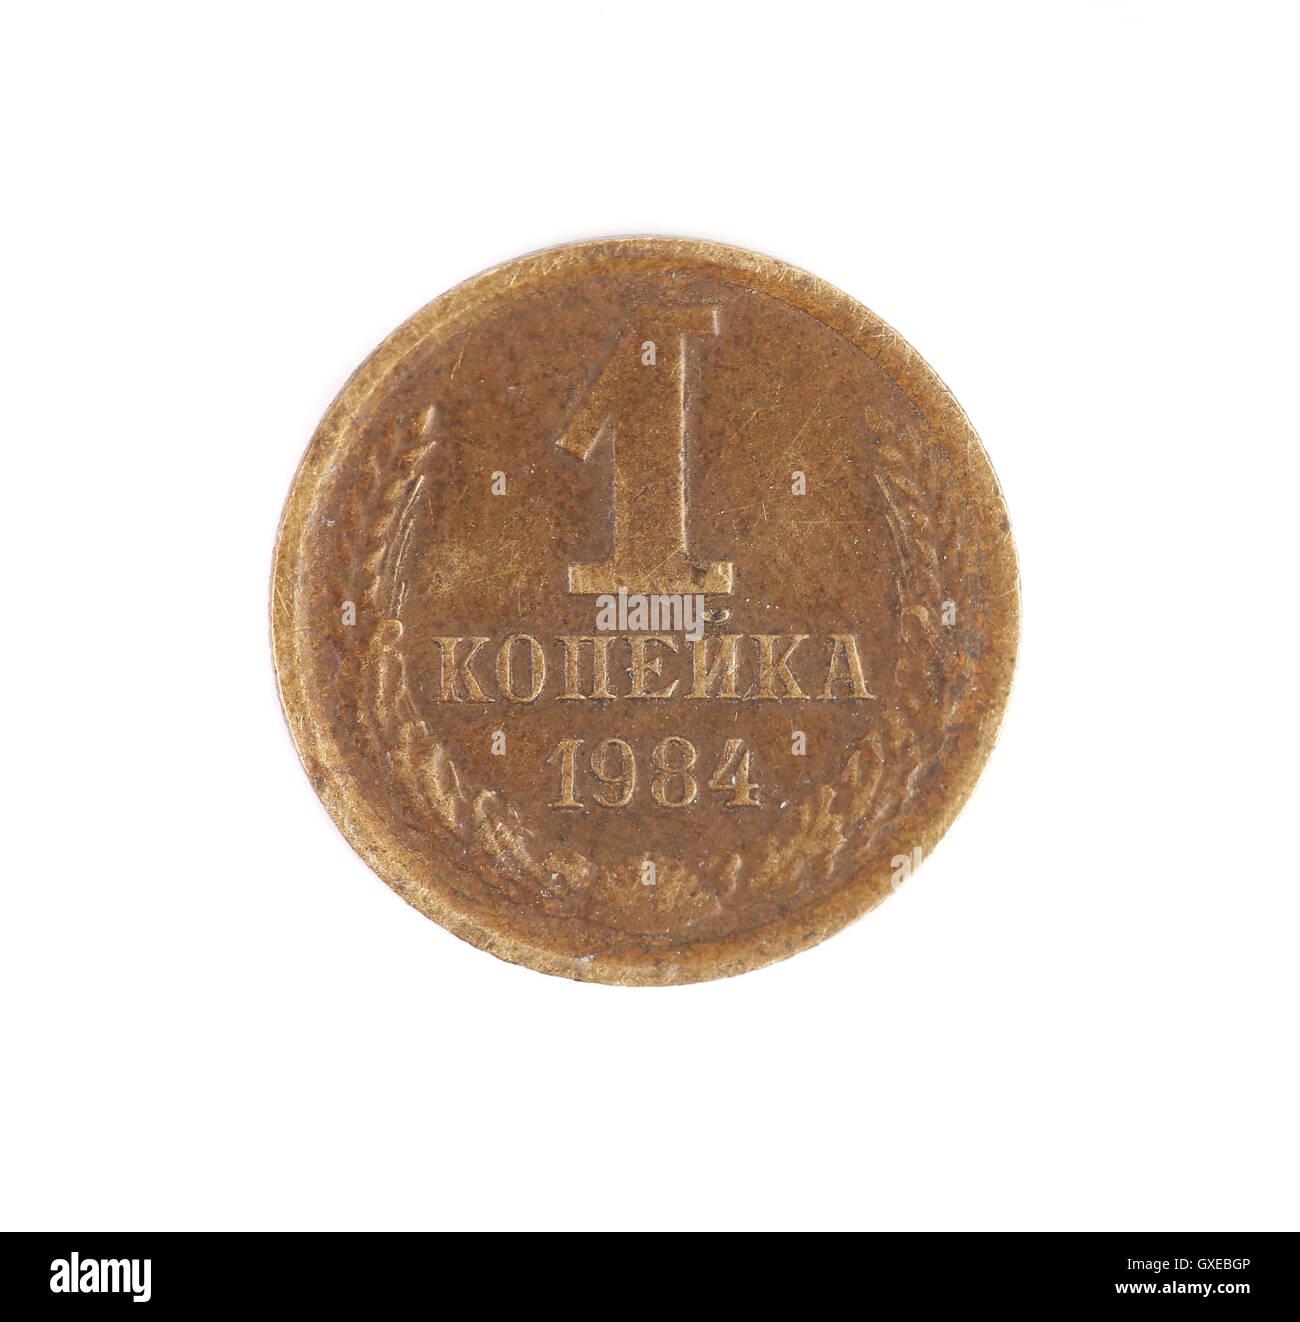 USSR 1 kopek coin - Stock Image